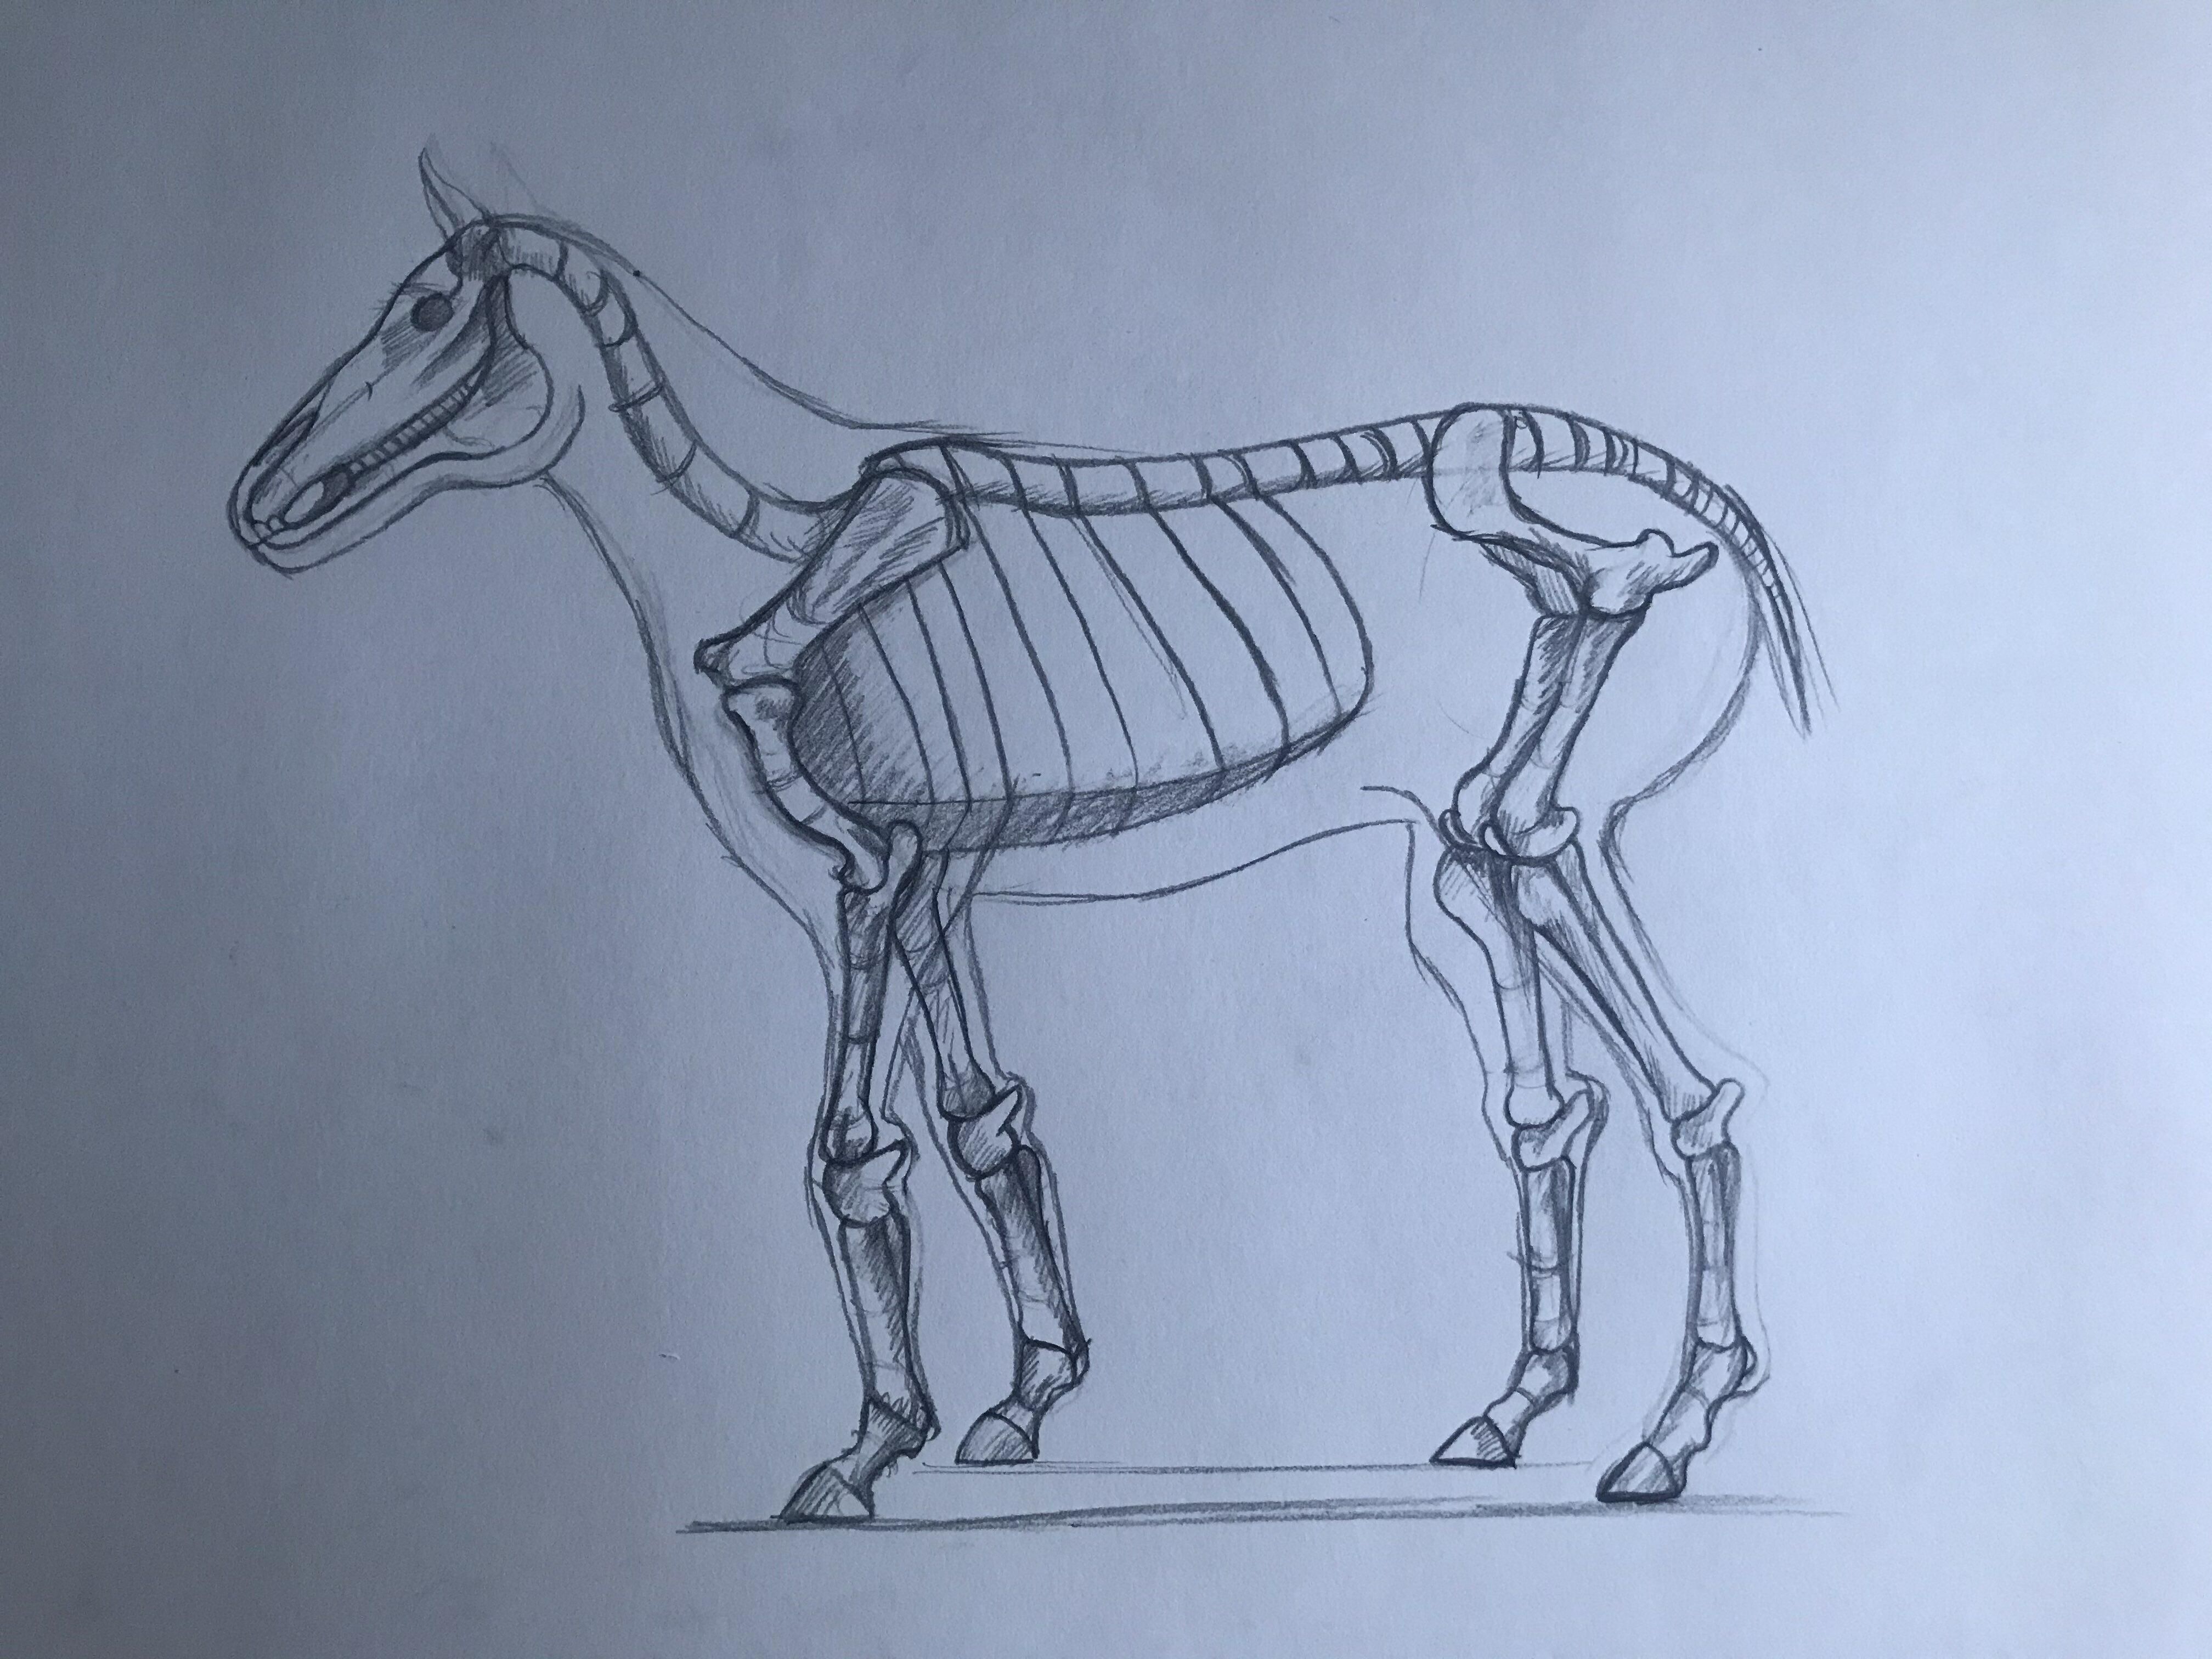 Minecraft Skeleton Horse By Lazyp0tat0 On Newgrounds